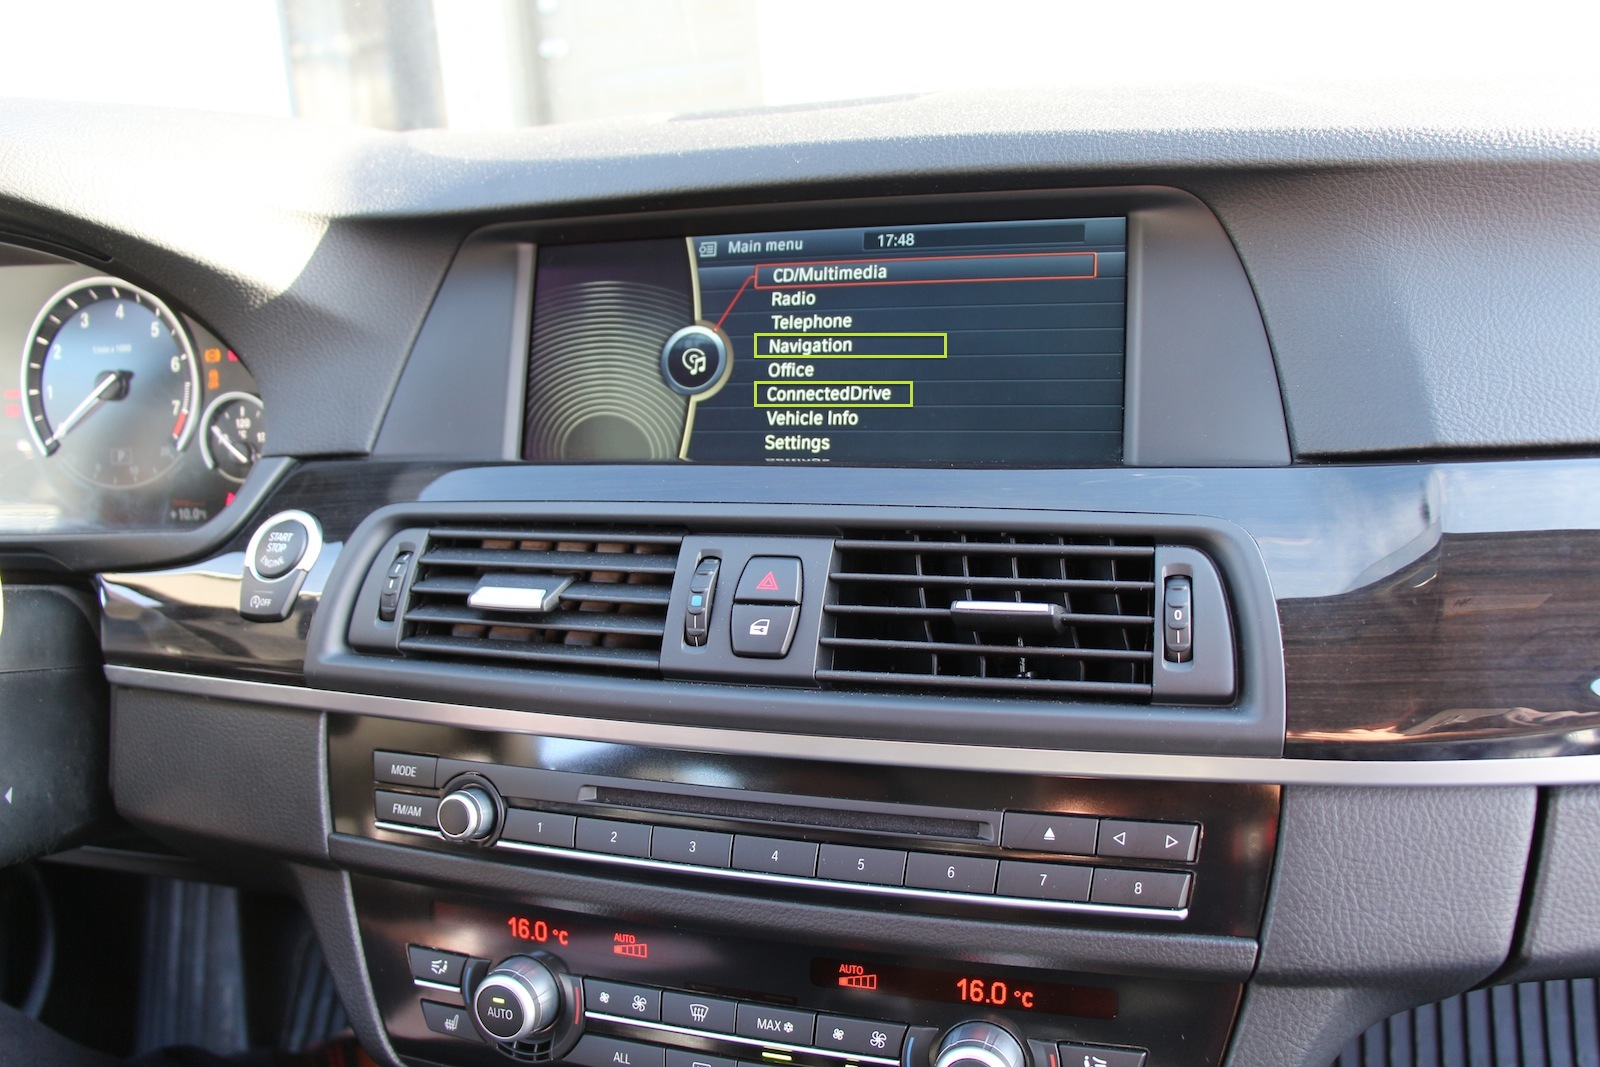 Retrofitting Navigation On My F10